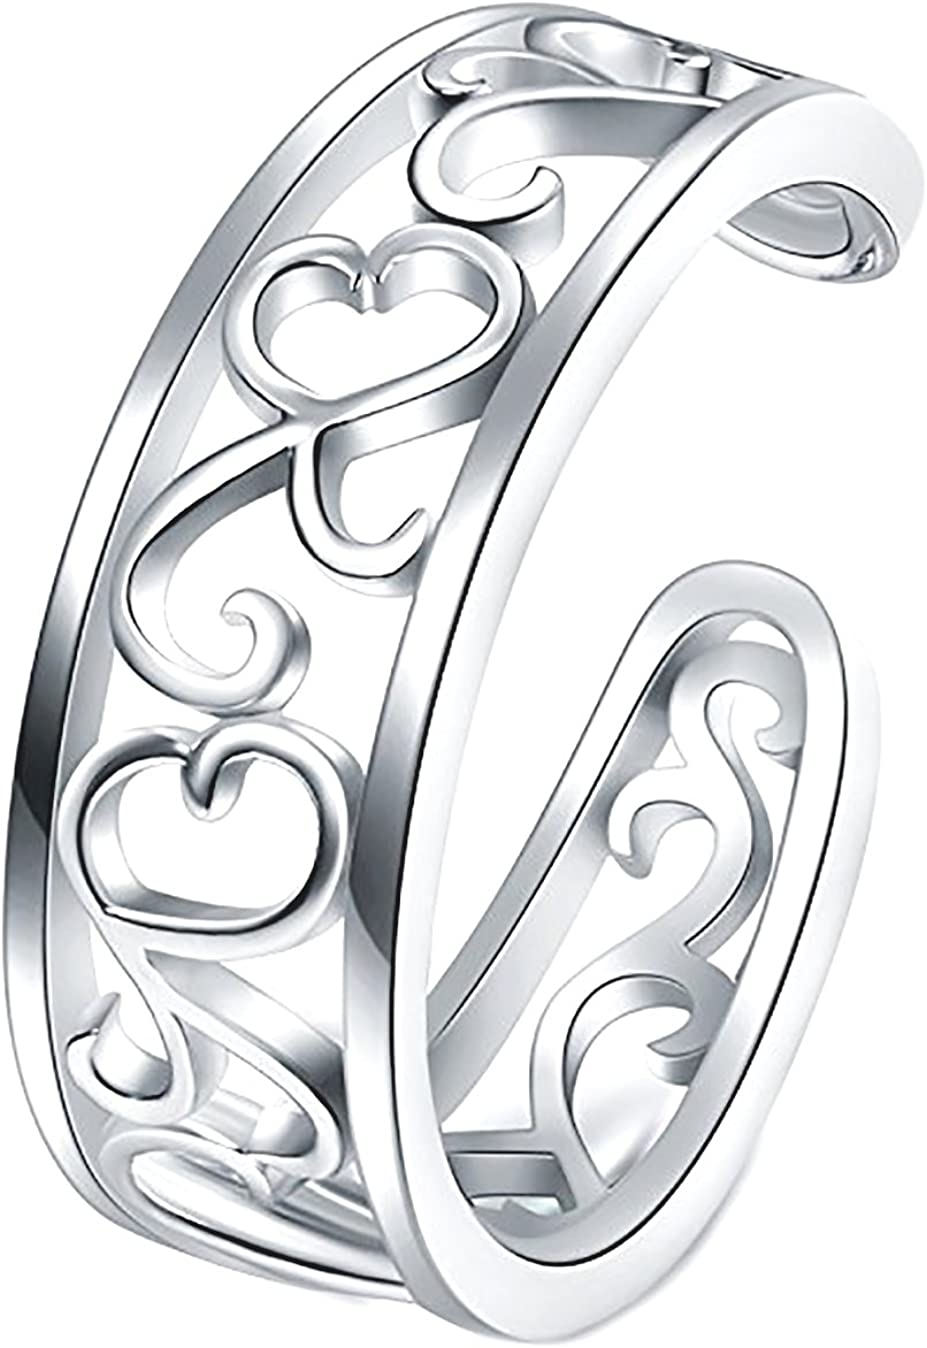 Luxury goods BORUO 925 Sterling Silver Toe Leaf 2021 model Adjusta Flower Ring Hawaiian